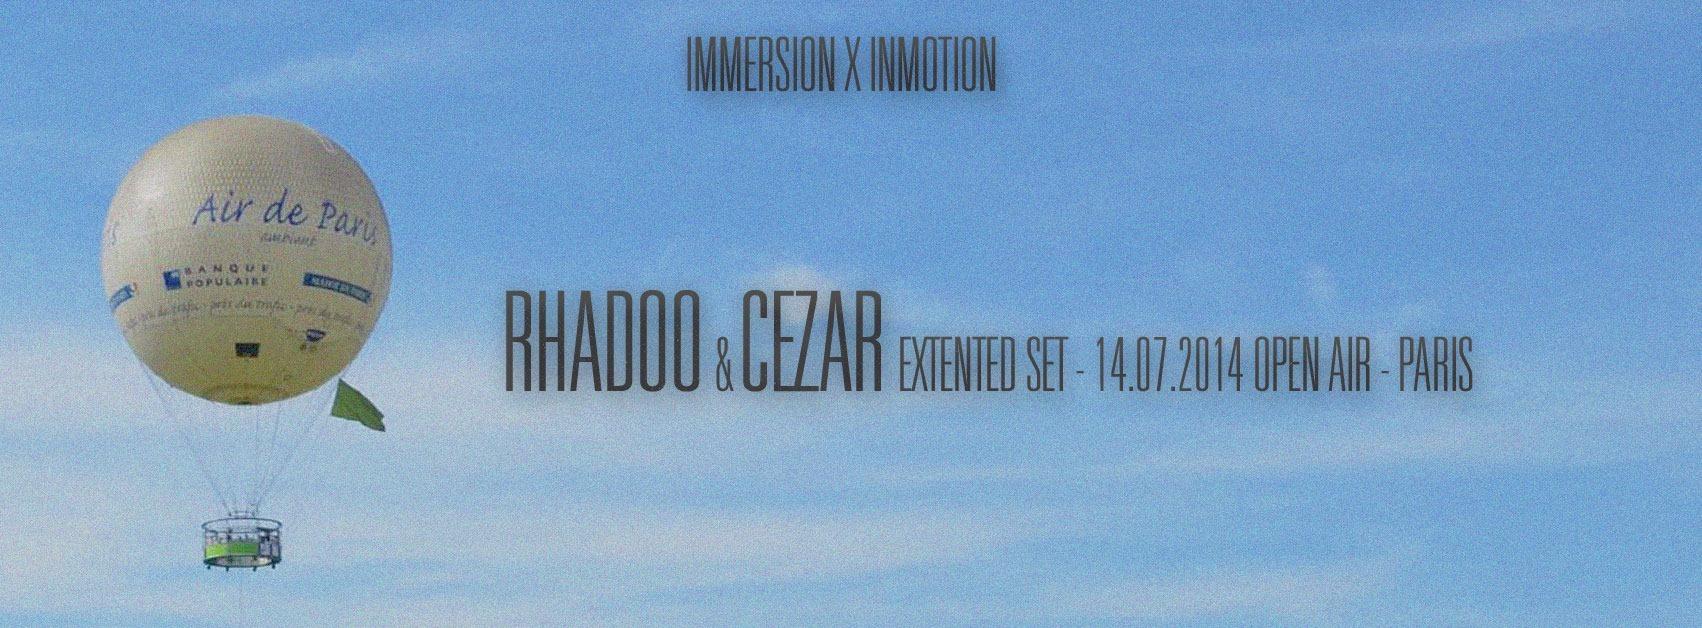 Open air : Immersion x Inmotion + Rhadoo + Cezar + Ekomine...